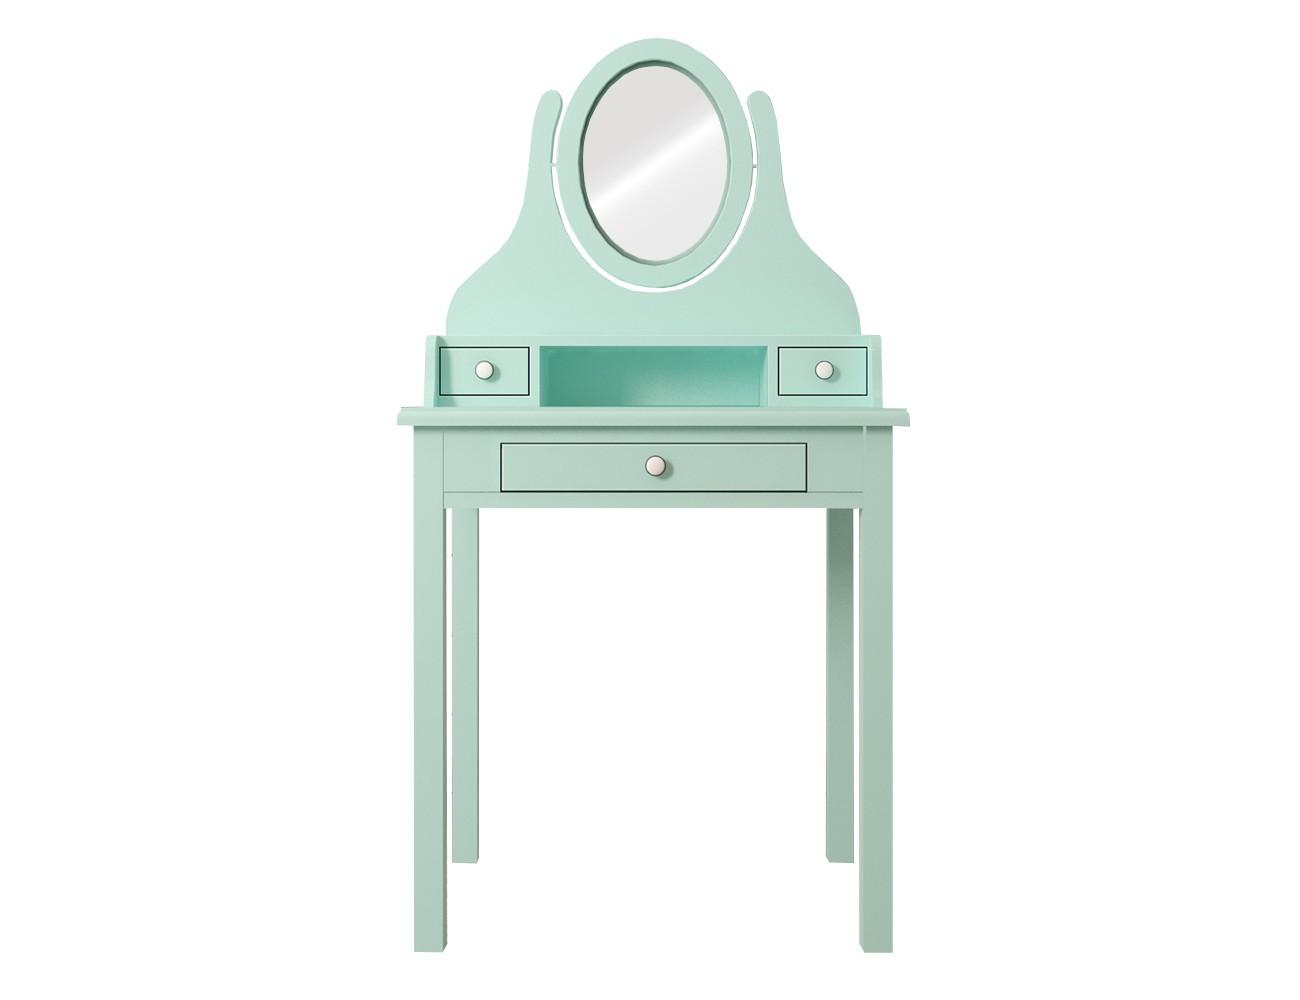 Туалетный столик AdelinaТуалетные столики<br><br><br>Material: Береза<br>Width см: 70<br>Depth см: 40<br>Height см: 136